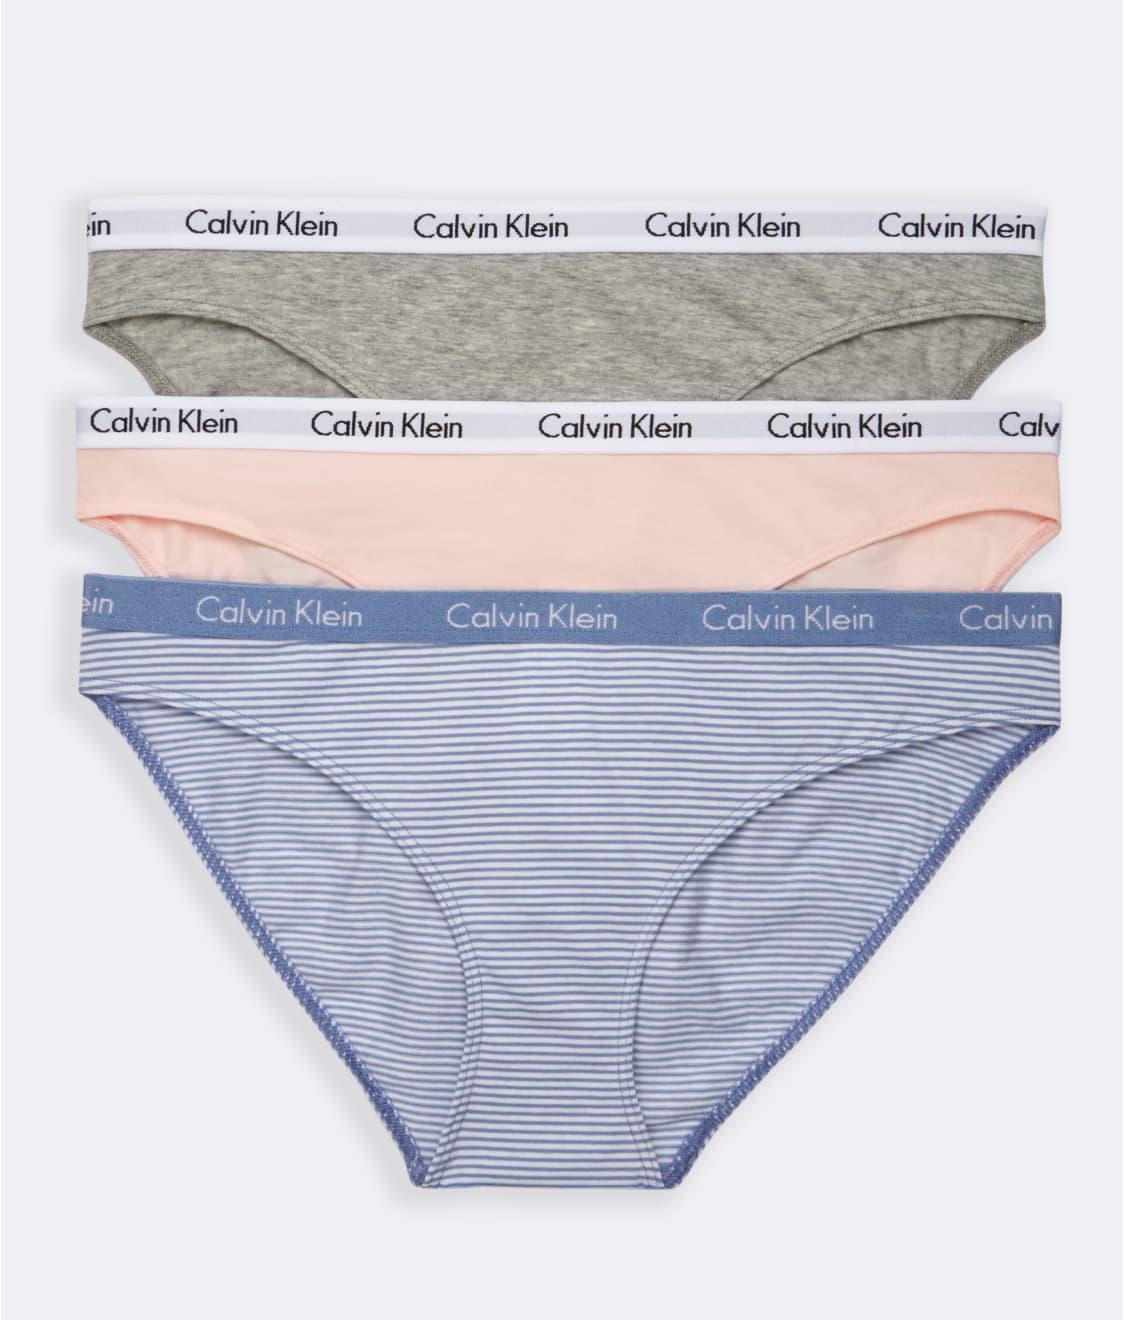 047c35be7f Calvin Klein Carousel Bikini 3-Pack